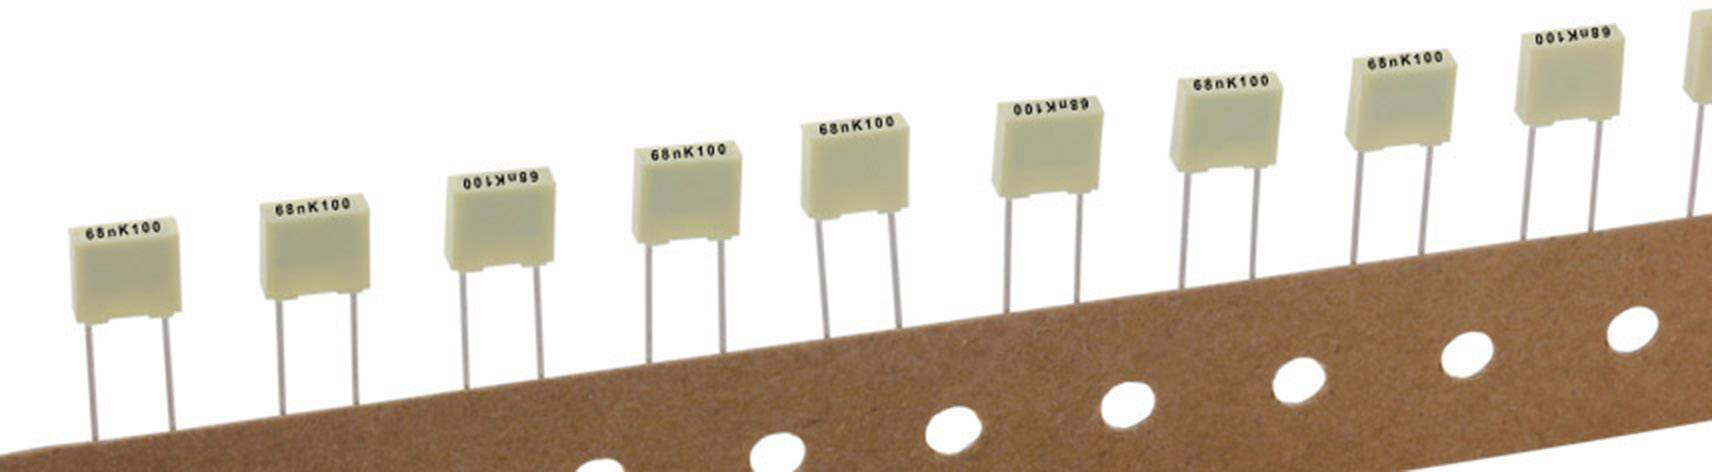 Polyesterový kondenzátor Kemet R82DC3680DQ60K+ radiální, 680 nF, 63 V,10 %, 5 mm, (d x š x v) 7.2 x 4.5 mm x 9.5 mm, 1 ks